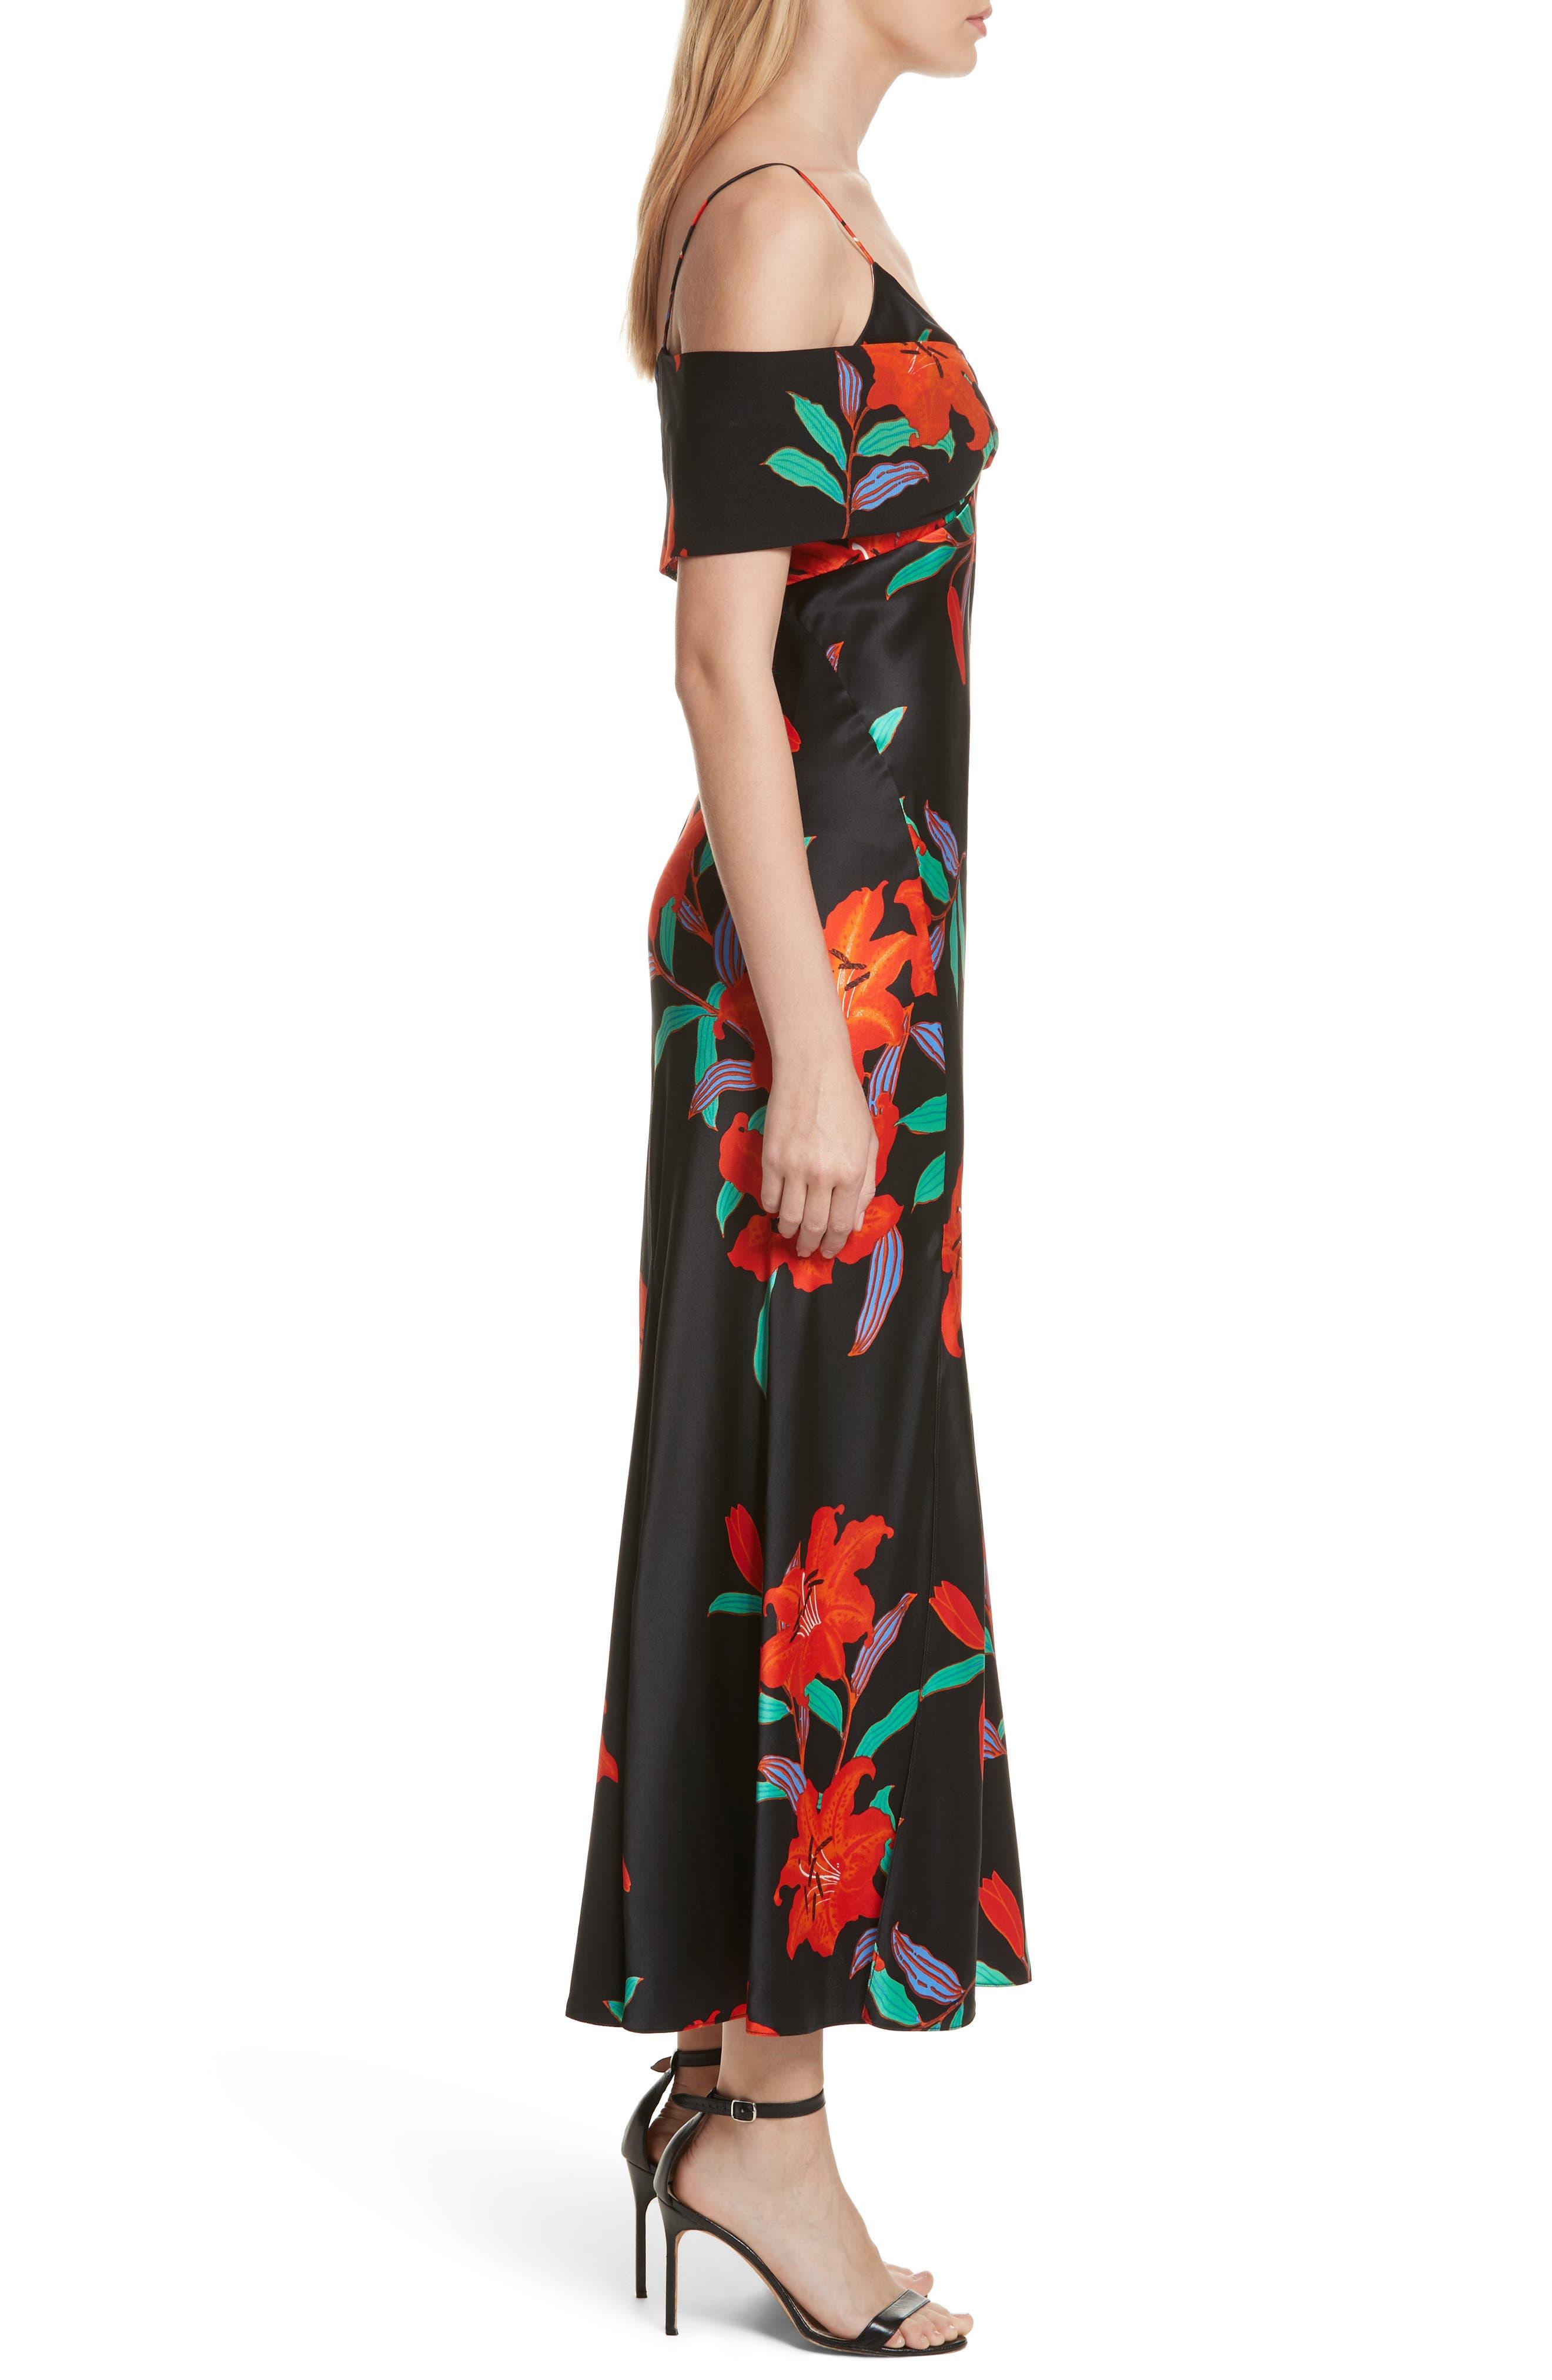 Diane von Furstenberg Asymmetrical Knotted Gown,                             Alternate thumbnail 3, color,                             Argos Black